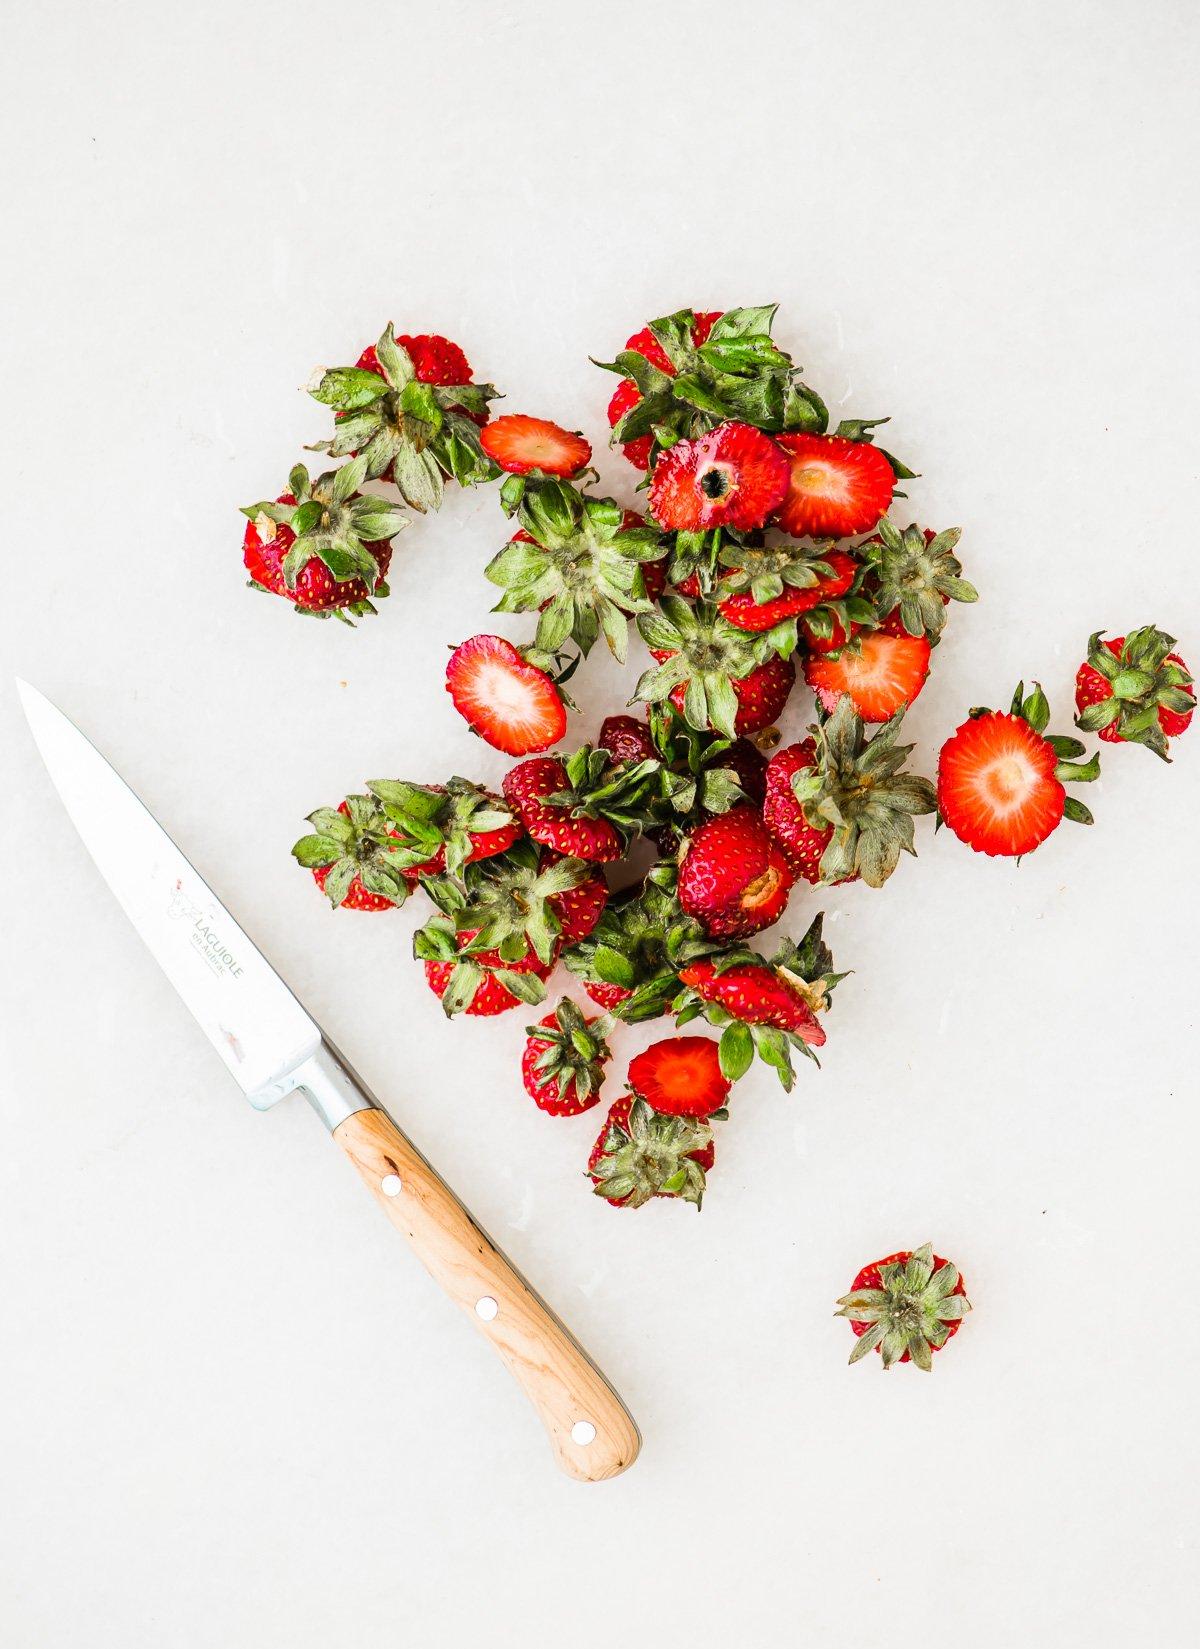 strawberry hulls